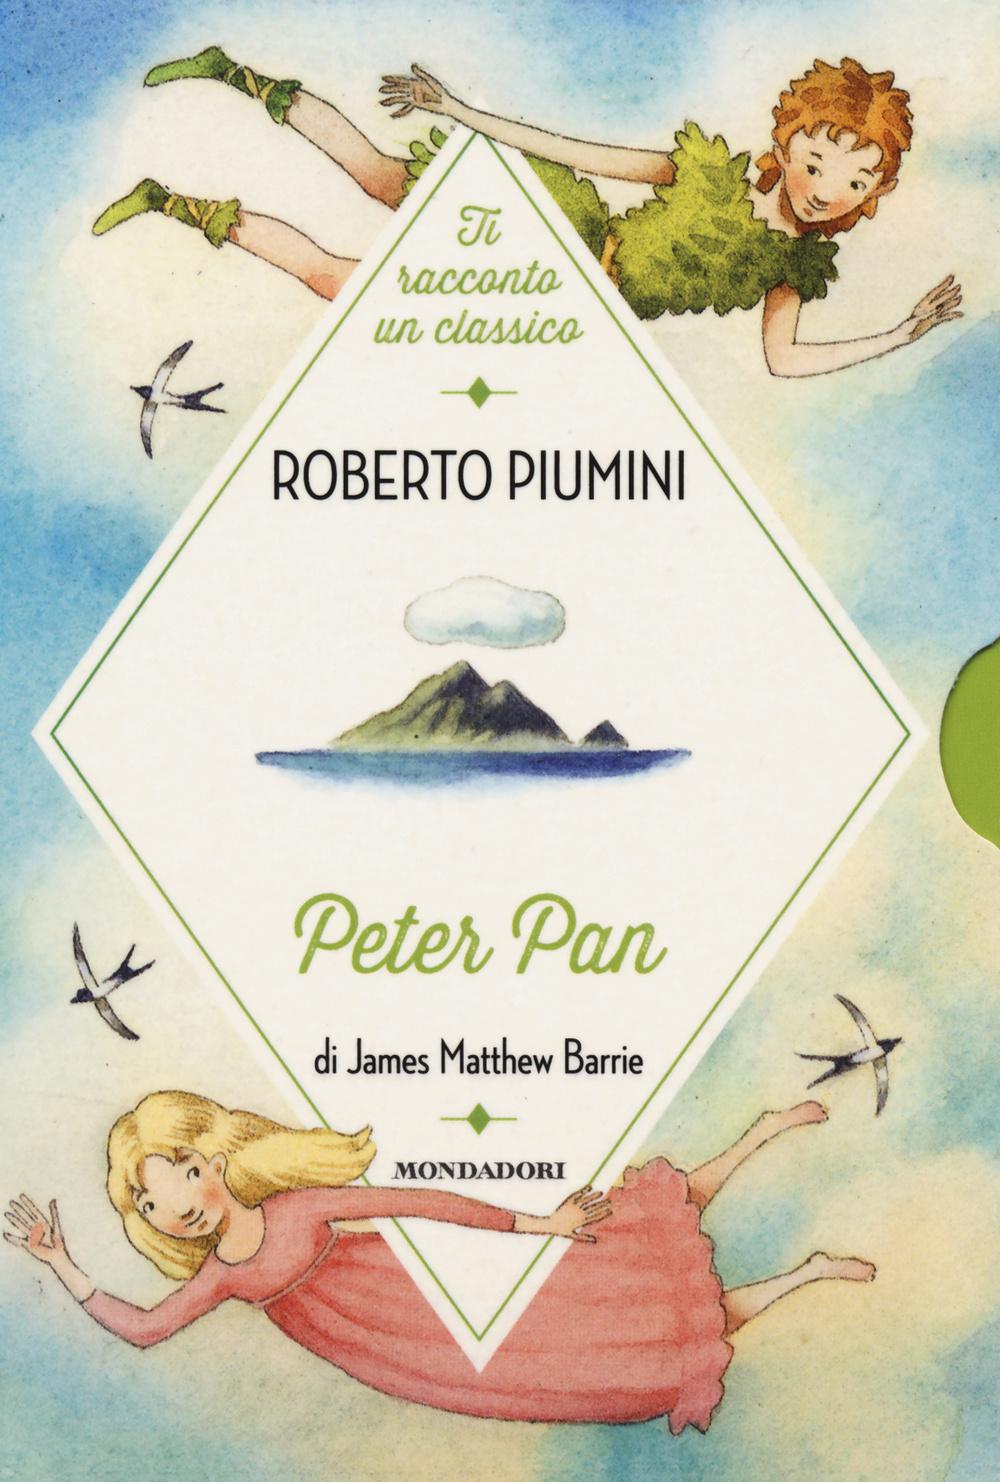 PETER PAN DI JAMES MATTHEW BARRIE - 9788804640387